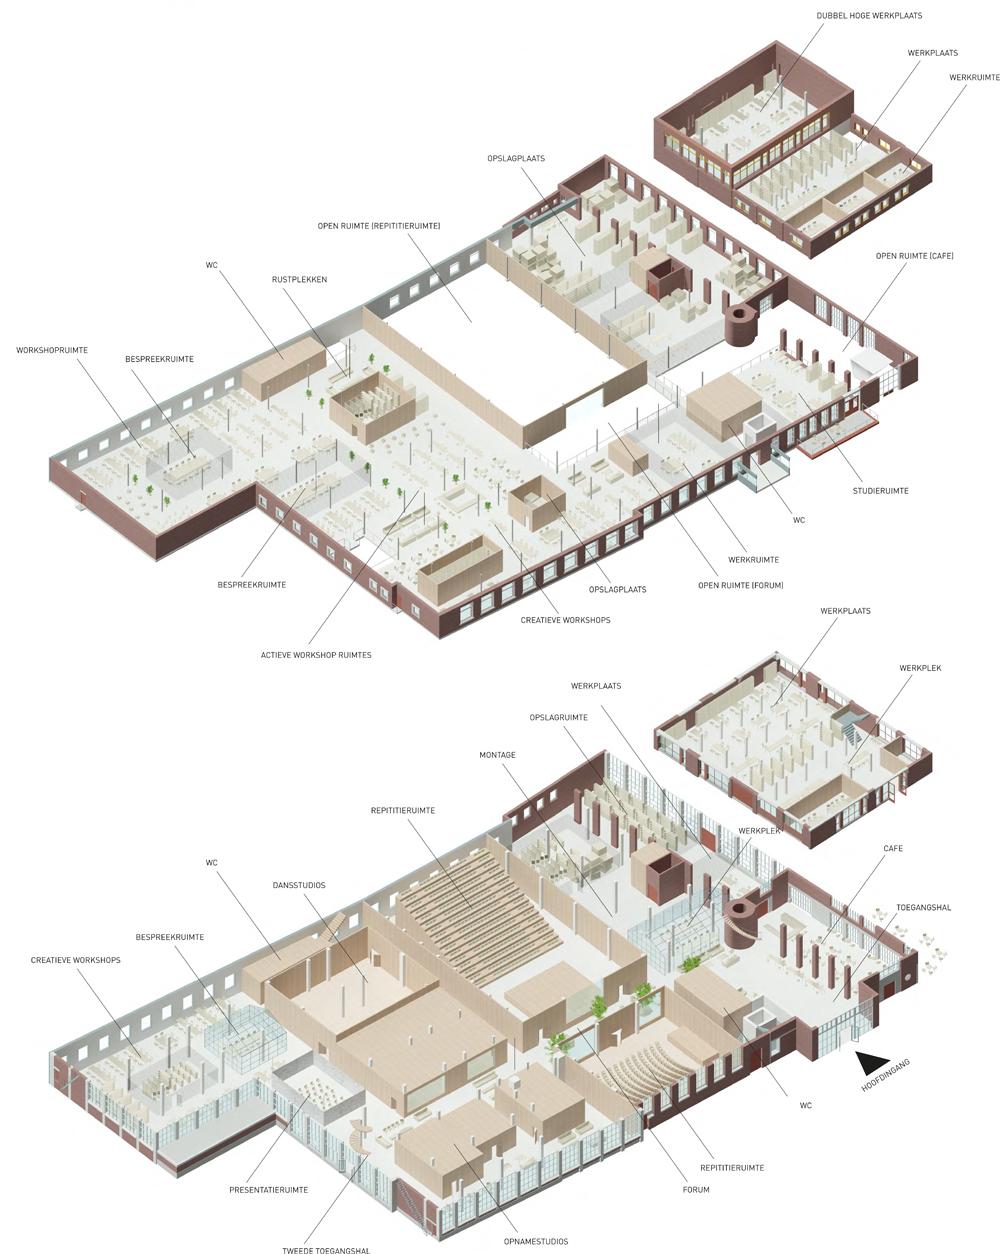 bliq_instant_utopia_gebouw_zuid